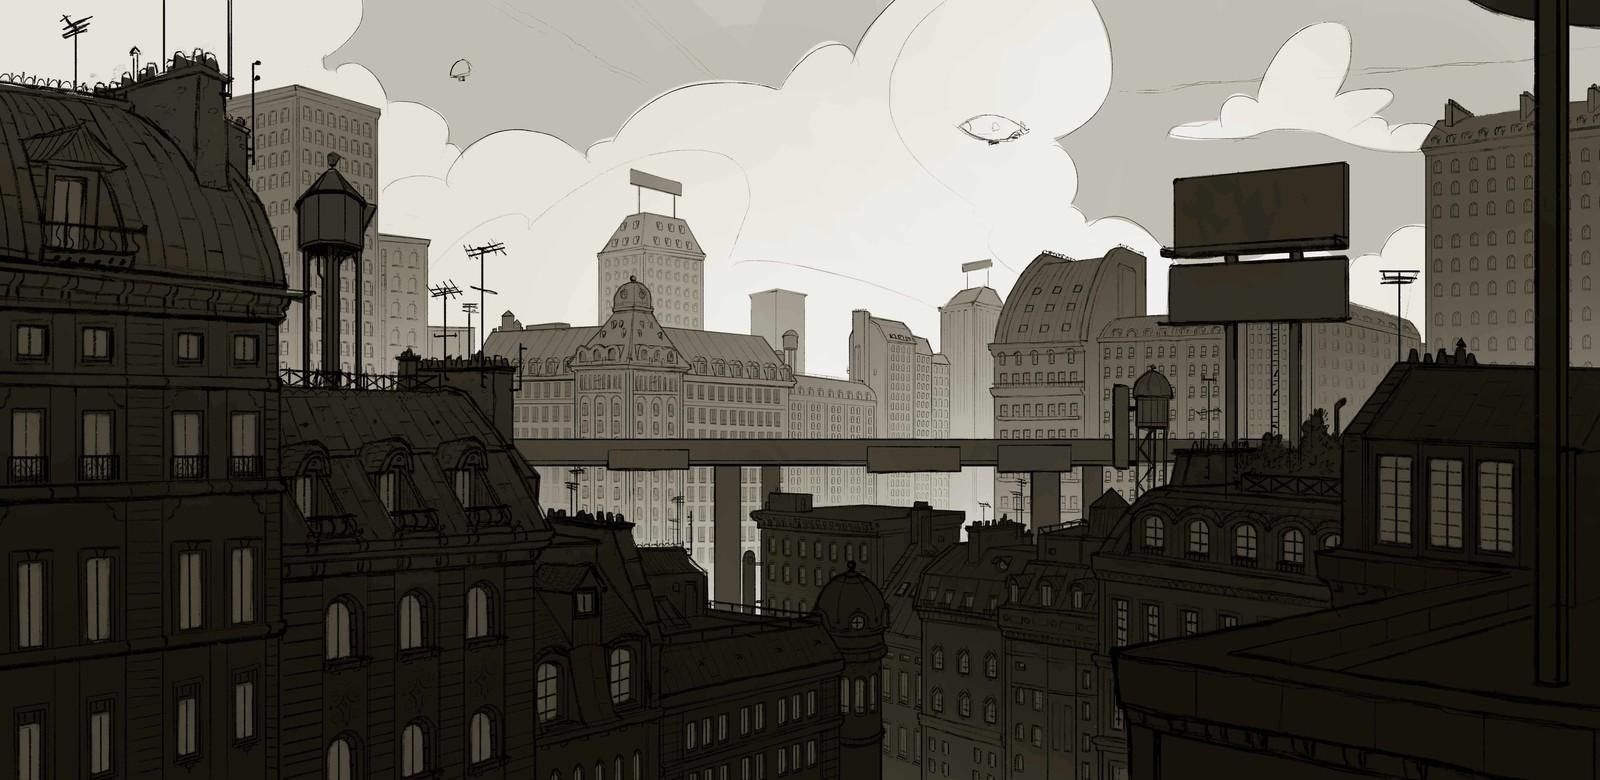 City Layout